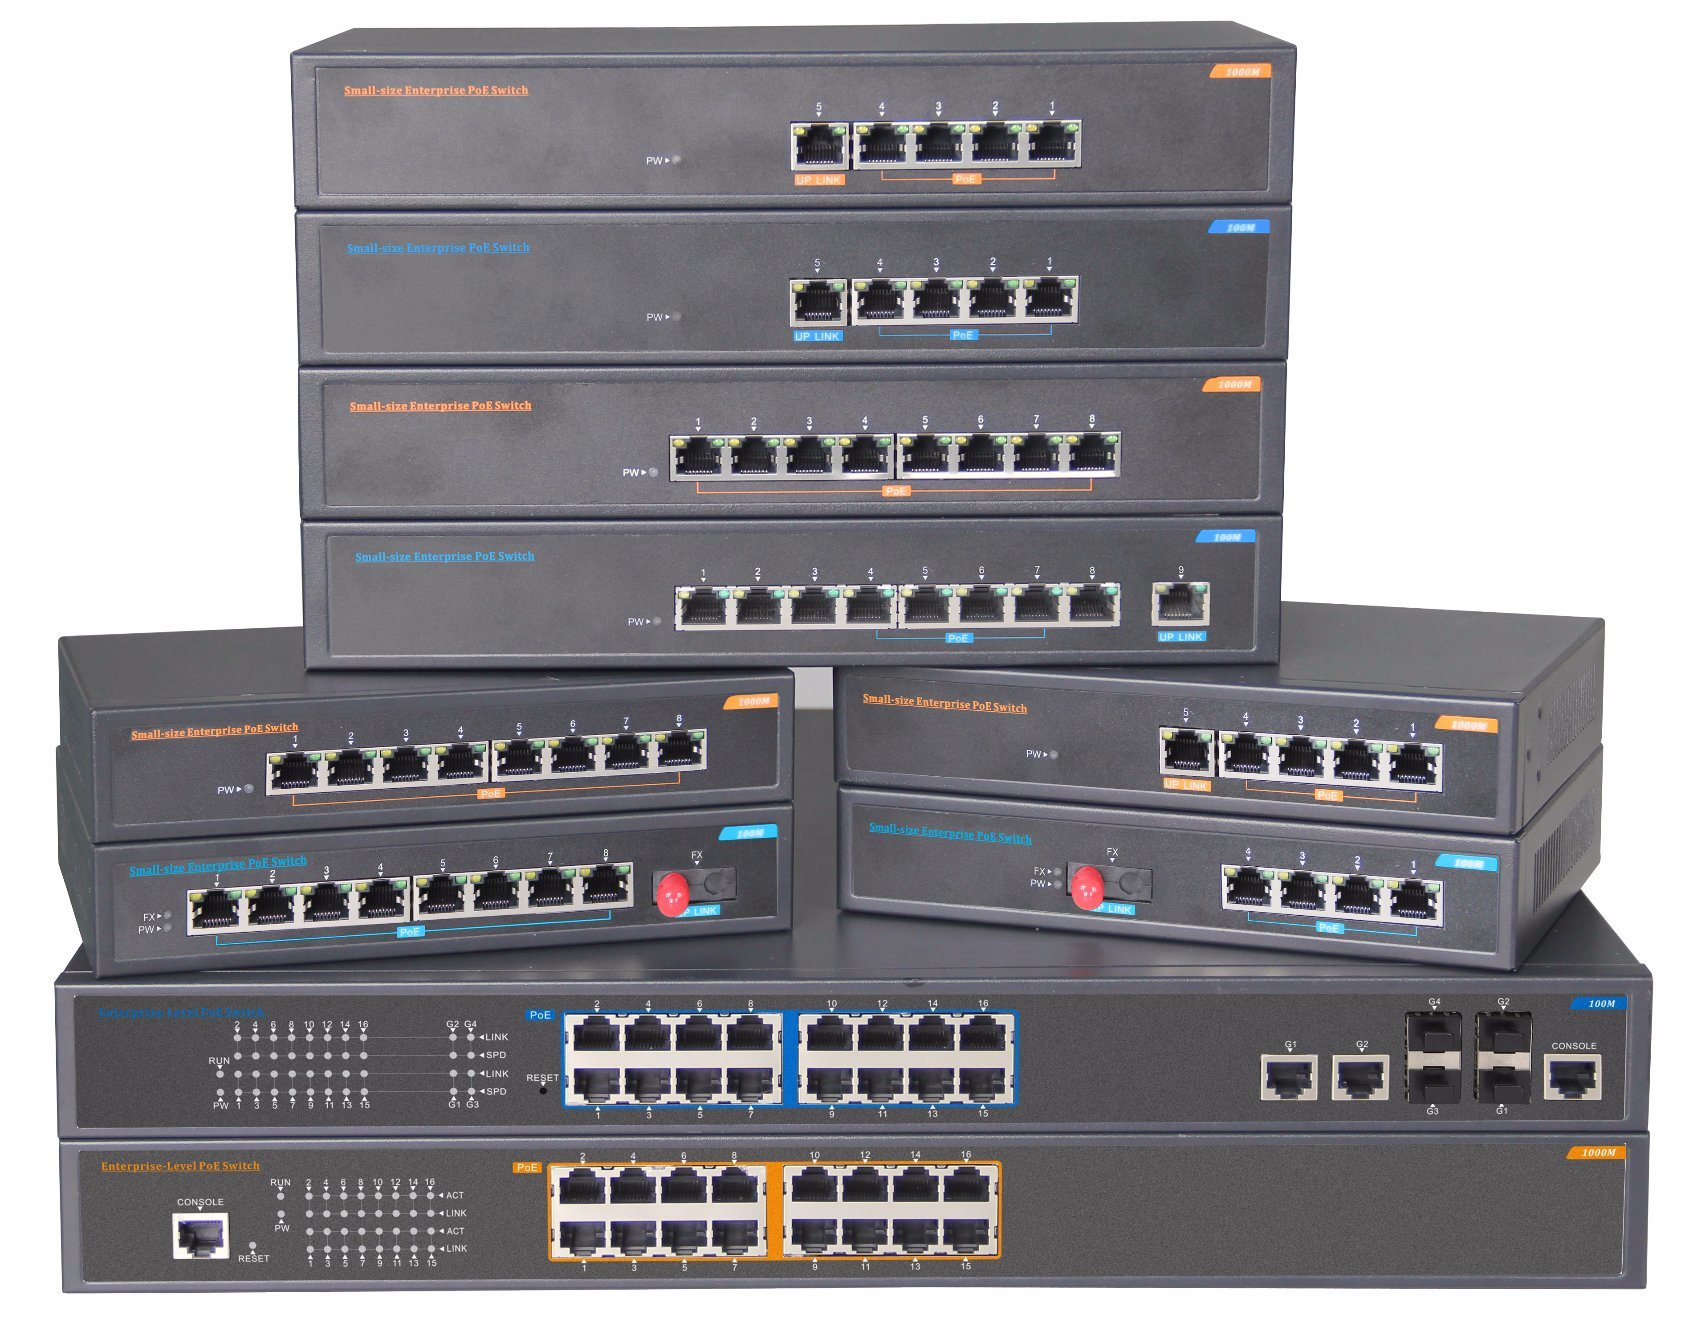 24 Port Managed Poe Fiber Ethernet Network Switch 15.4W